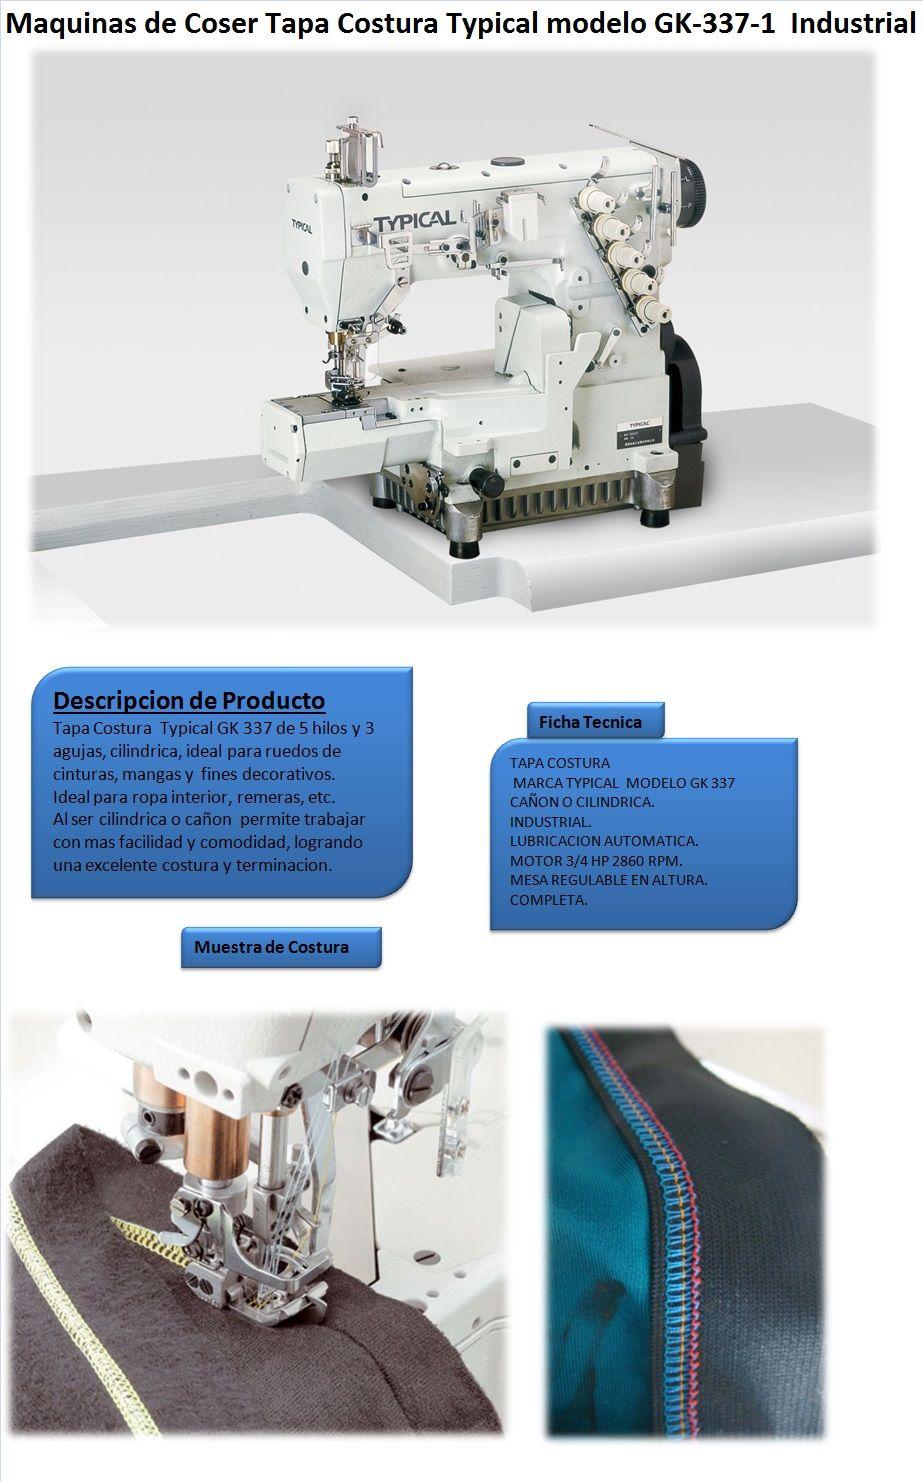 Maquina De Coser Tapa Costura Cañon Typical Modelo Gk-337-1 | Lider ...